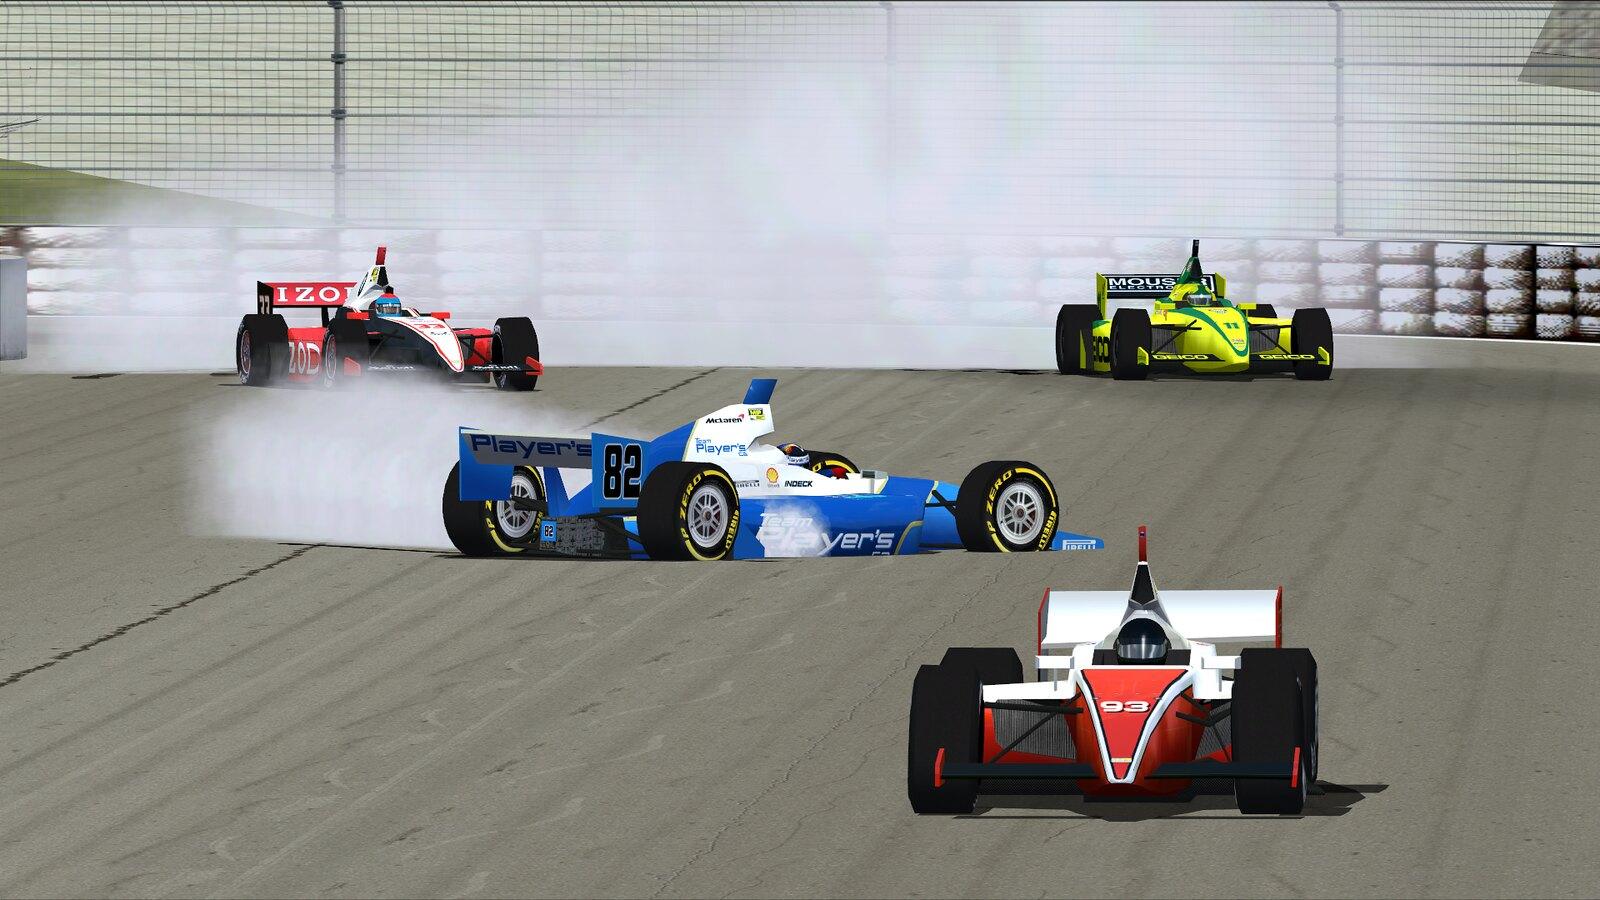 Lotus Grand Prix of Long Beach [33L] 7413262412_515a9e19ee_h